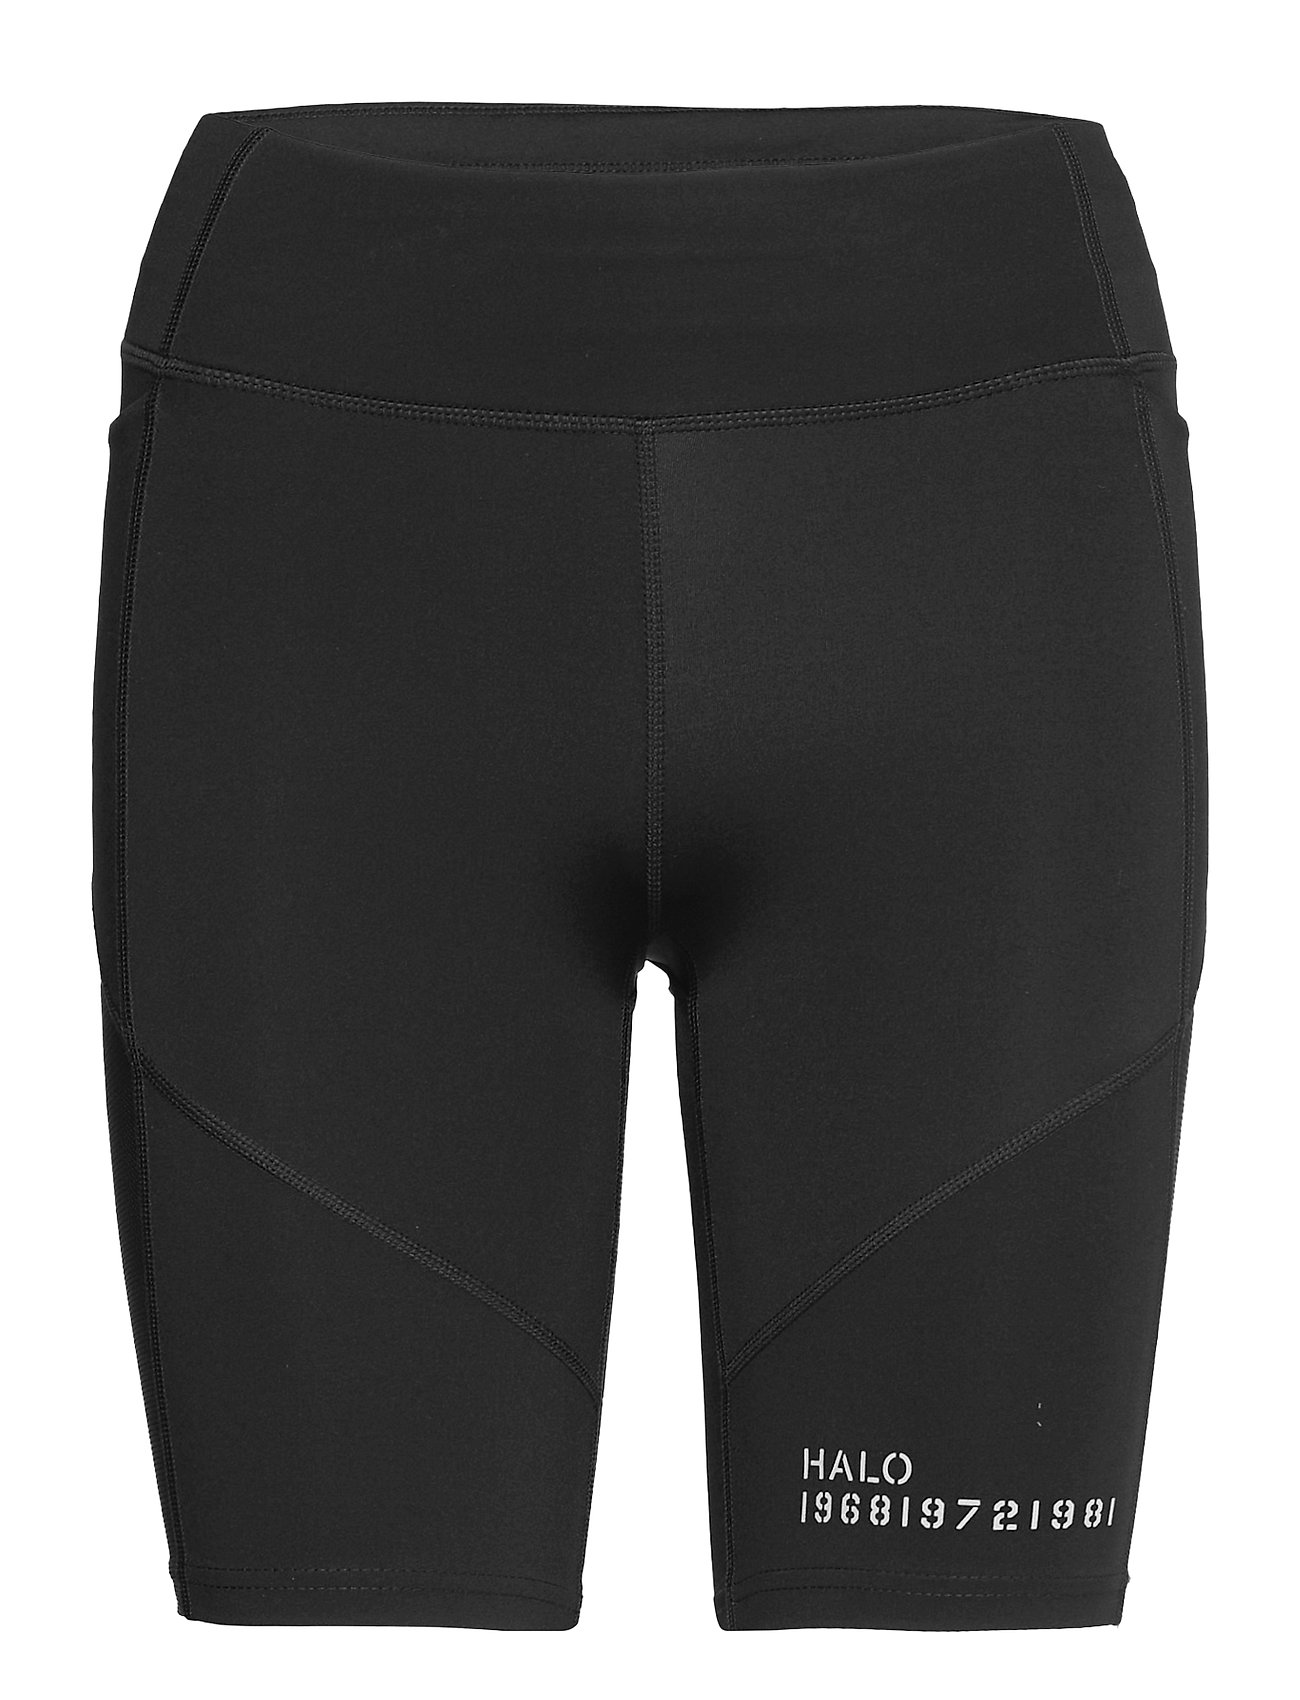 HALO - HALO WOMENS SPRINTERS - black - 0